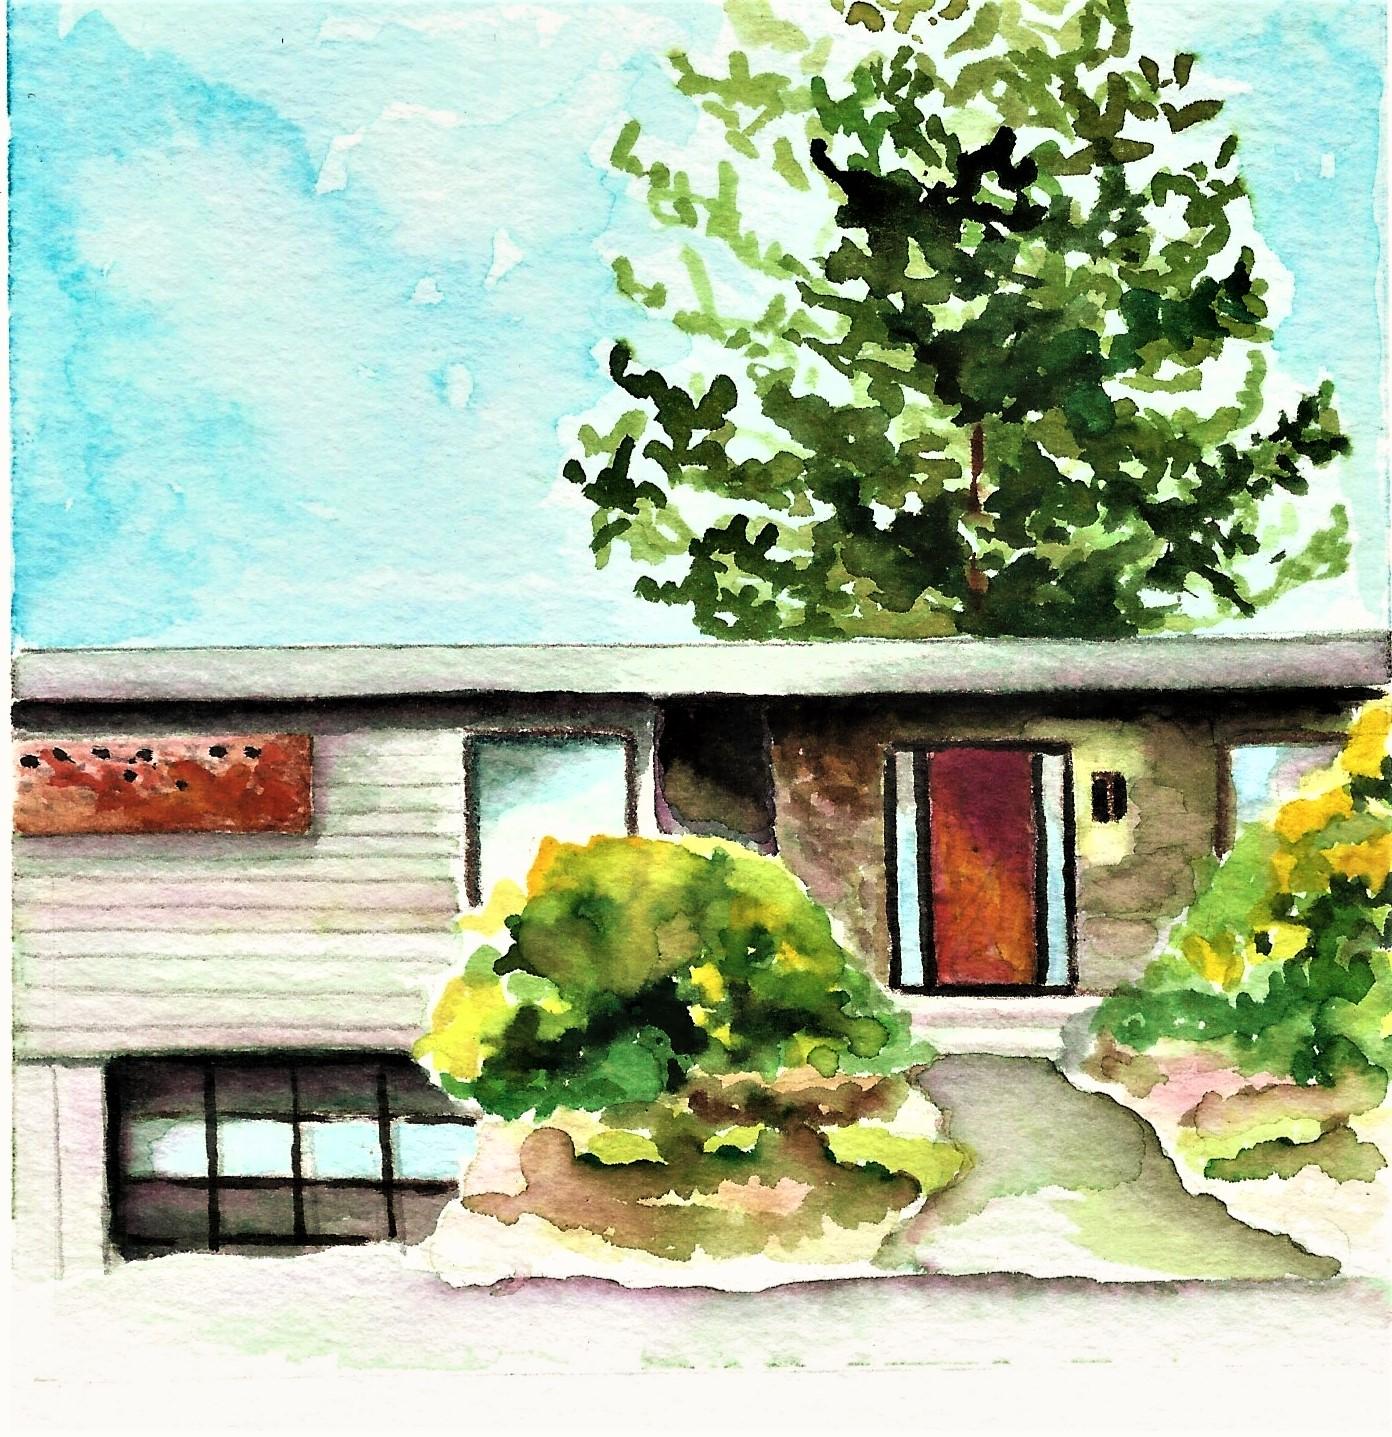 6 NOTECARD SET - RESTORE OREGONMIDCENTURY MODERN SERIES 2019EUGENIS/AMY HOME